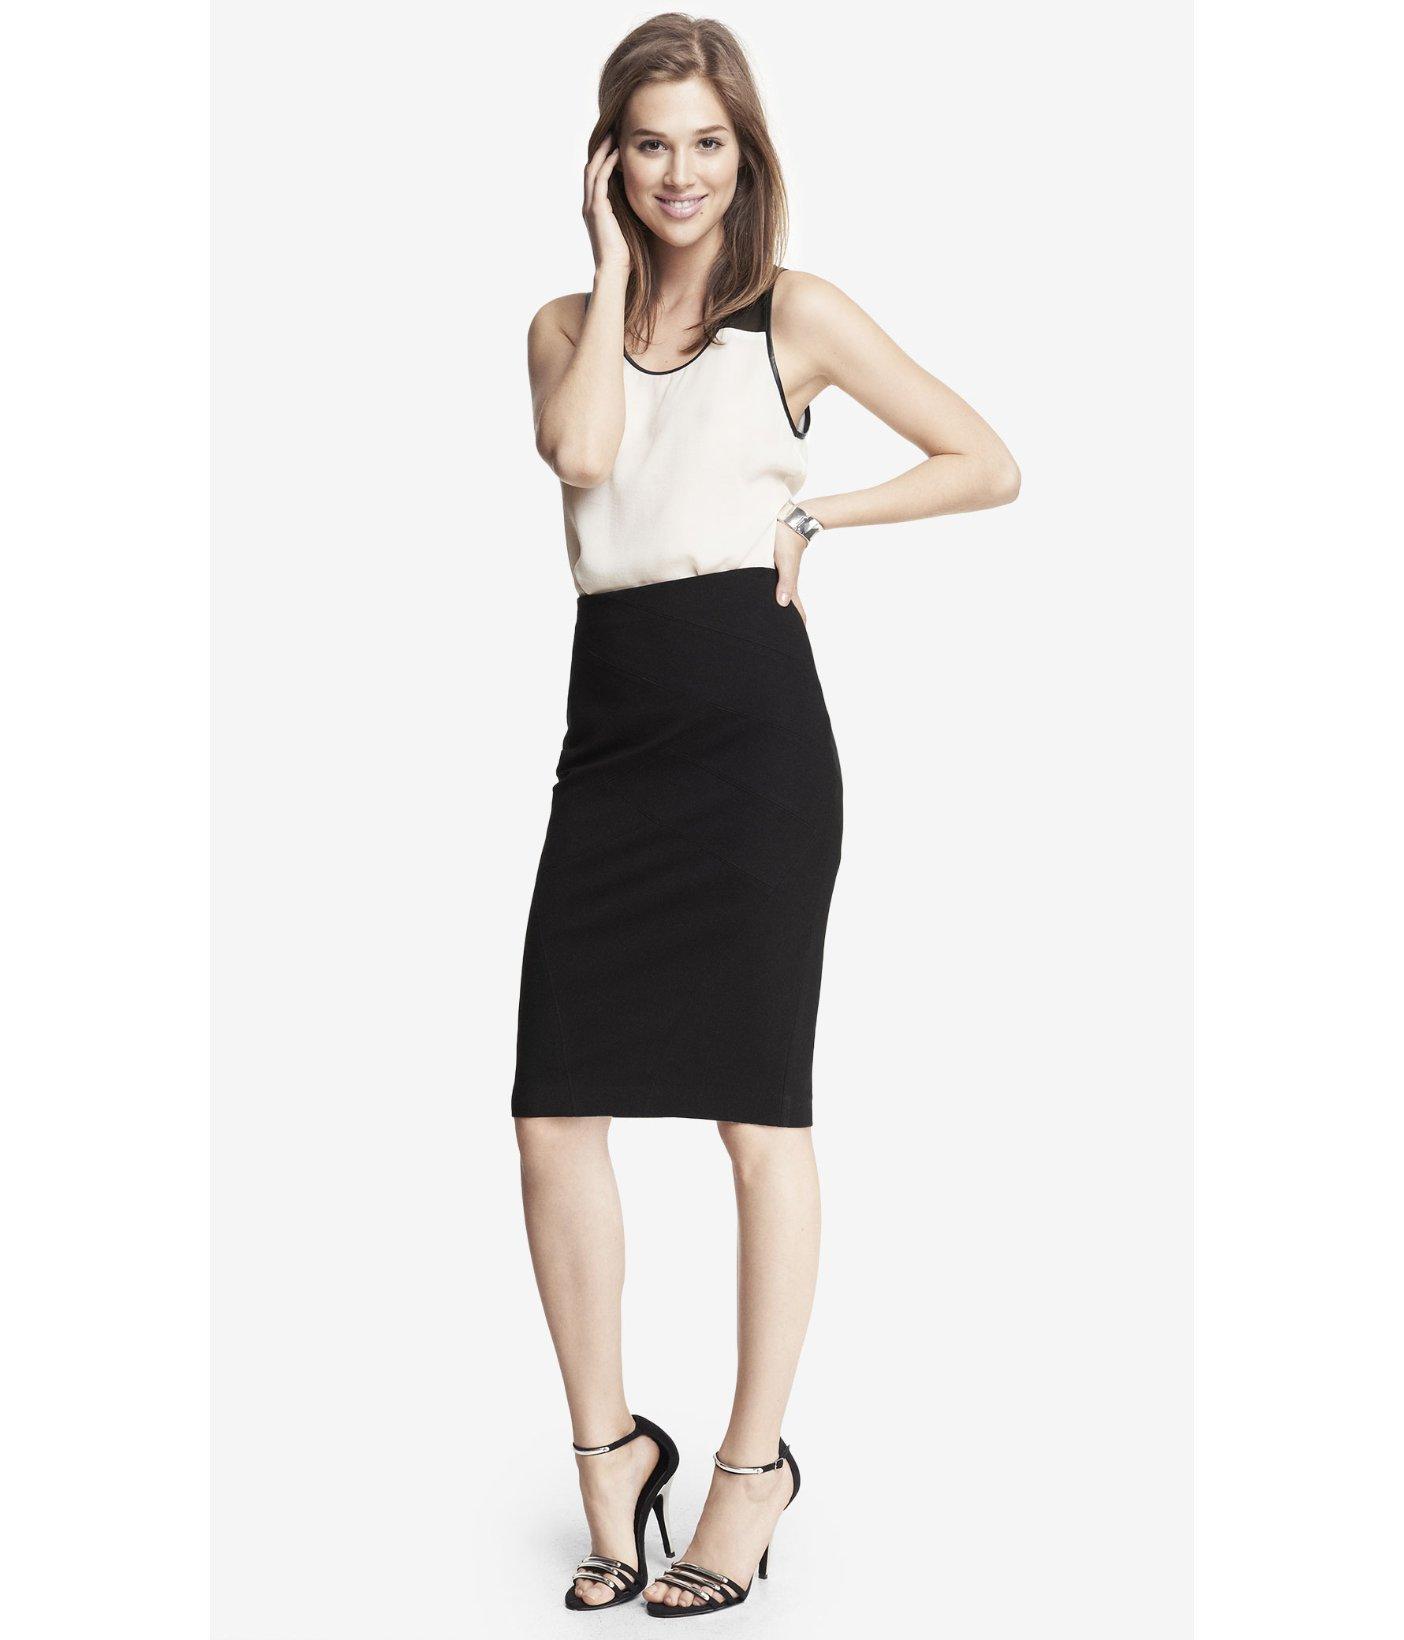 Express High Waist Ponte Knit Bandage Midi Skirt in Black   Lyst